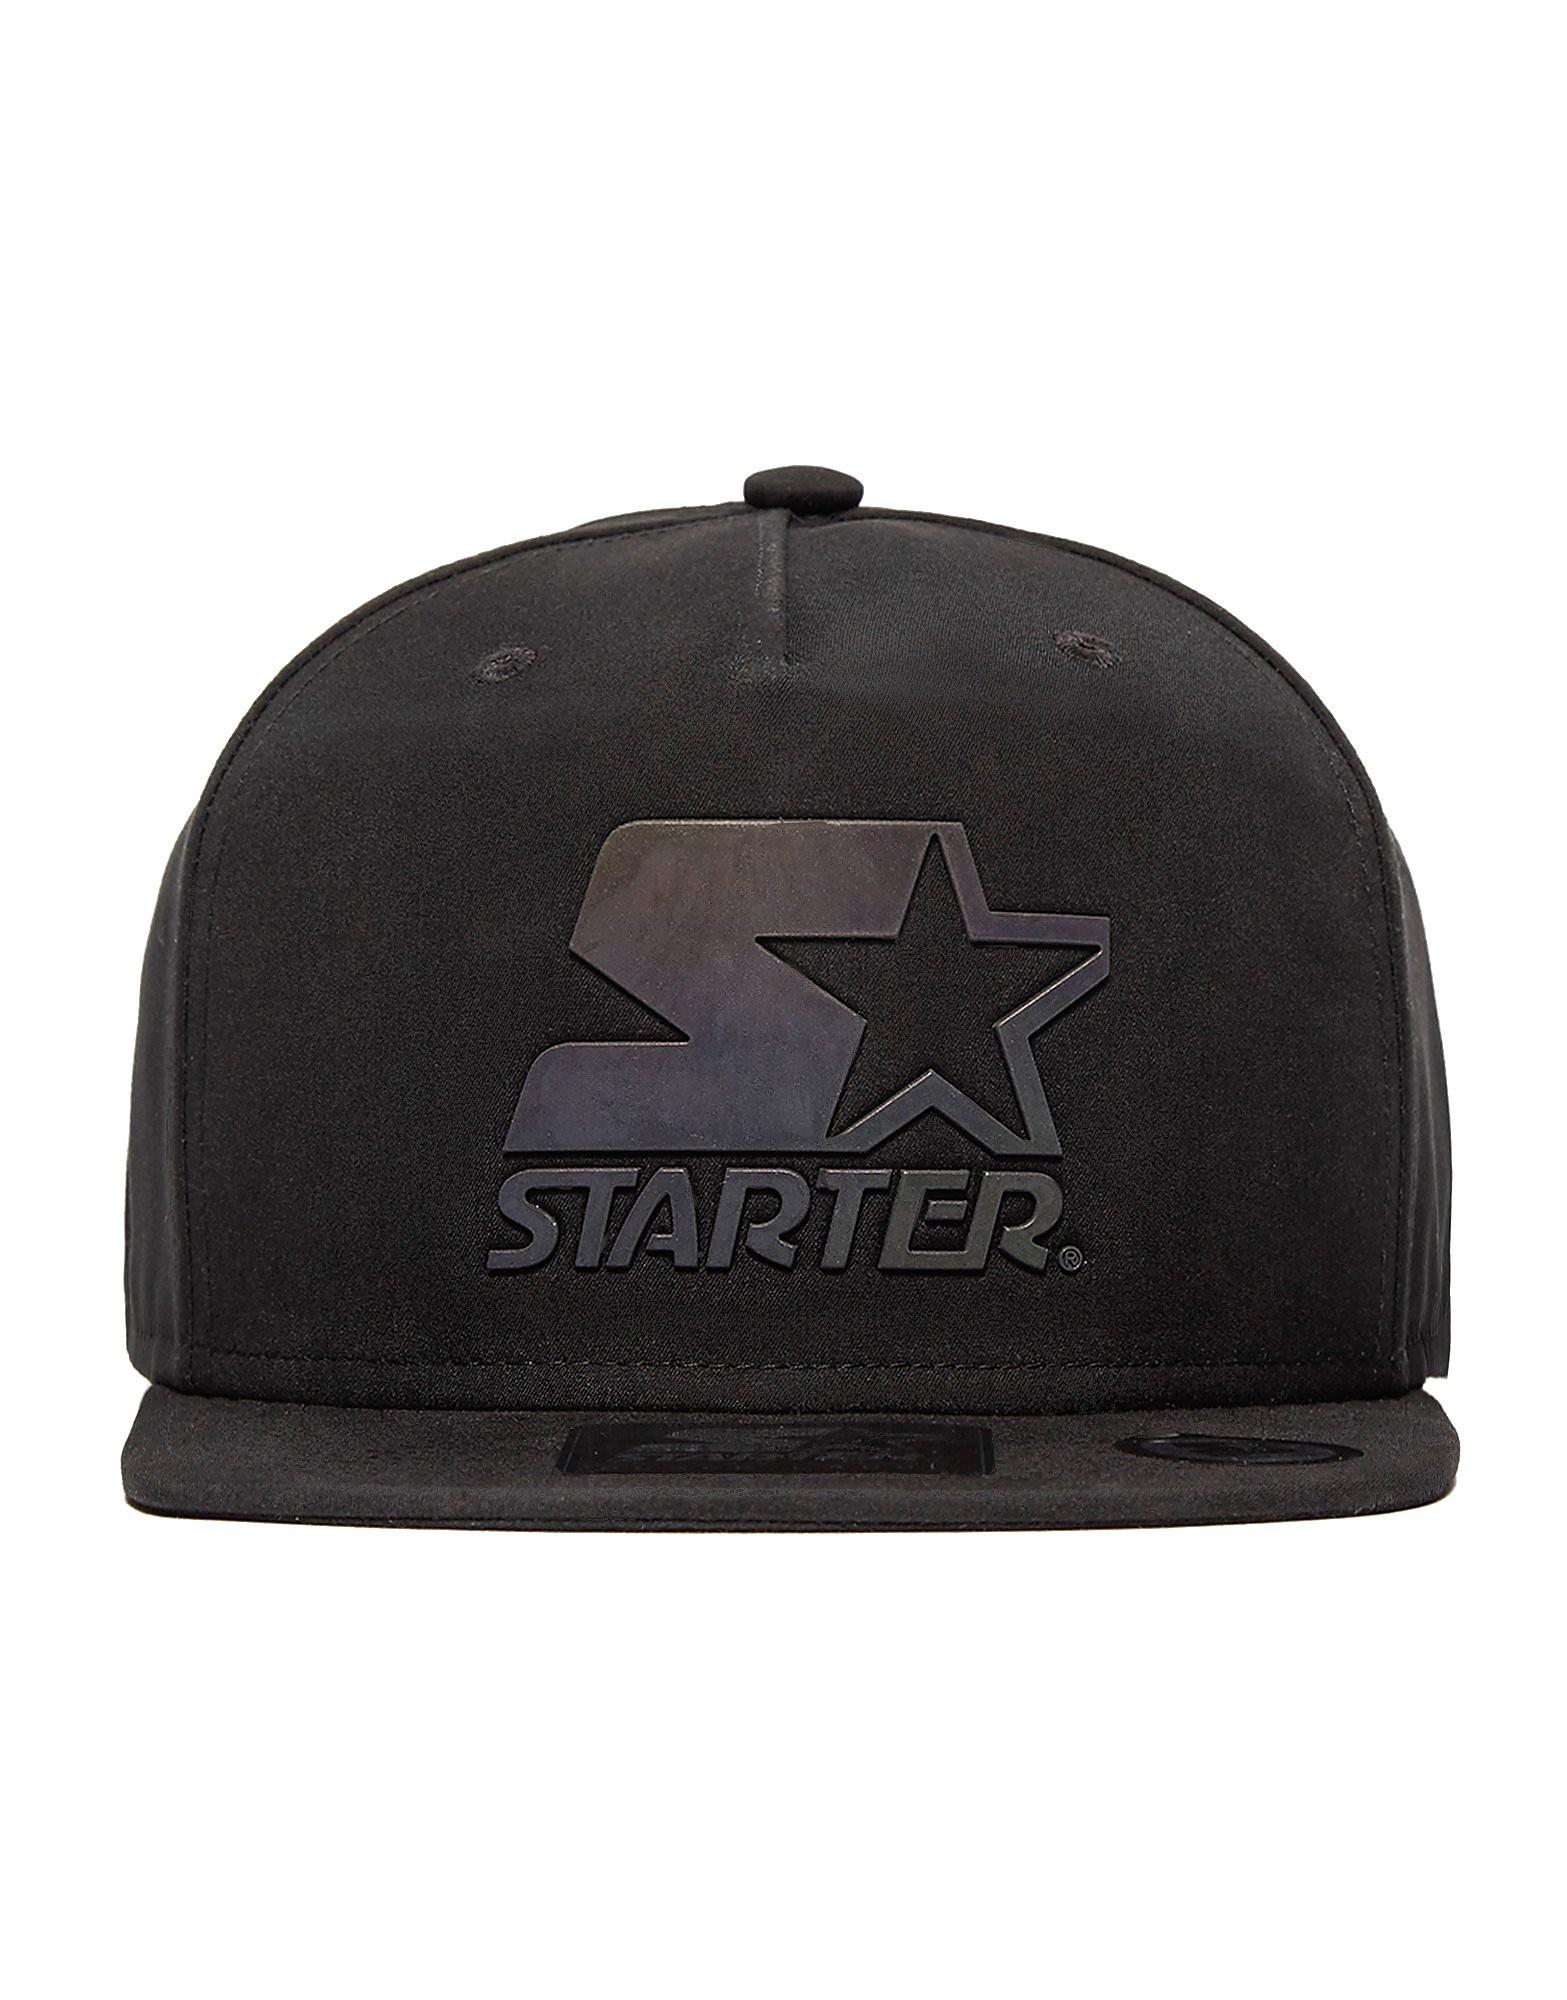 Starter Iridescent Snapback Cap